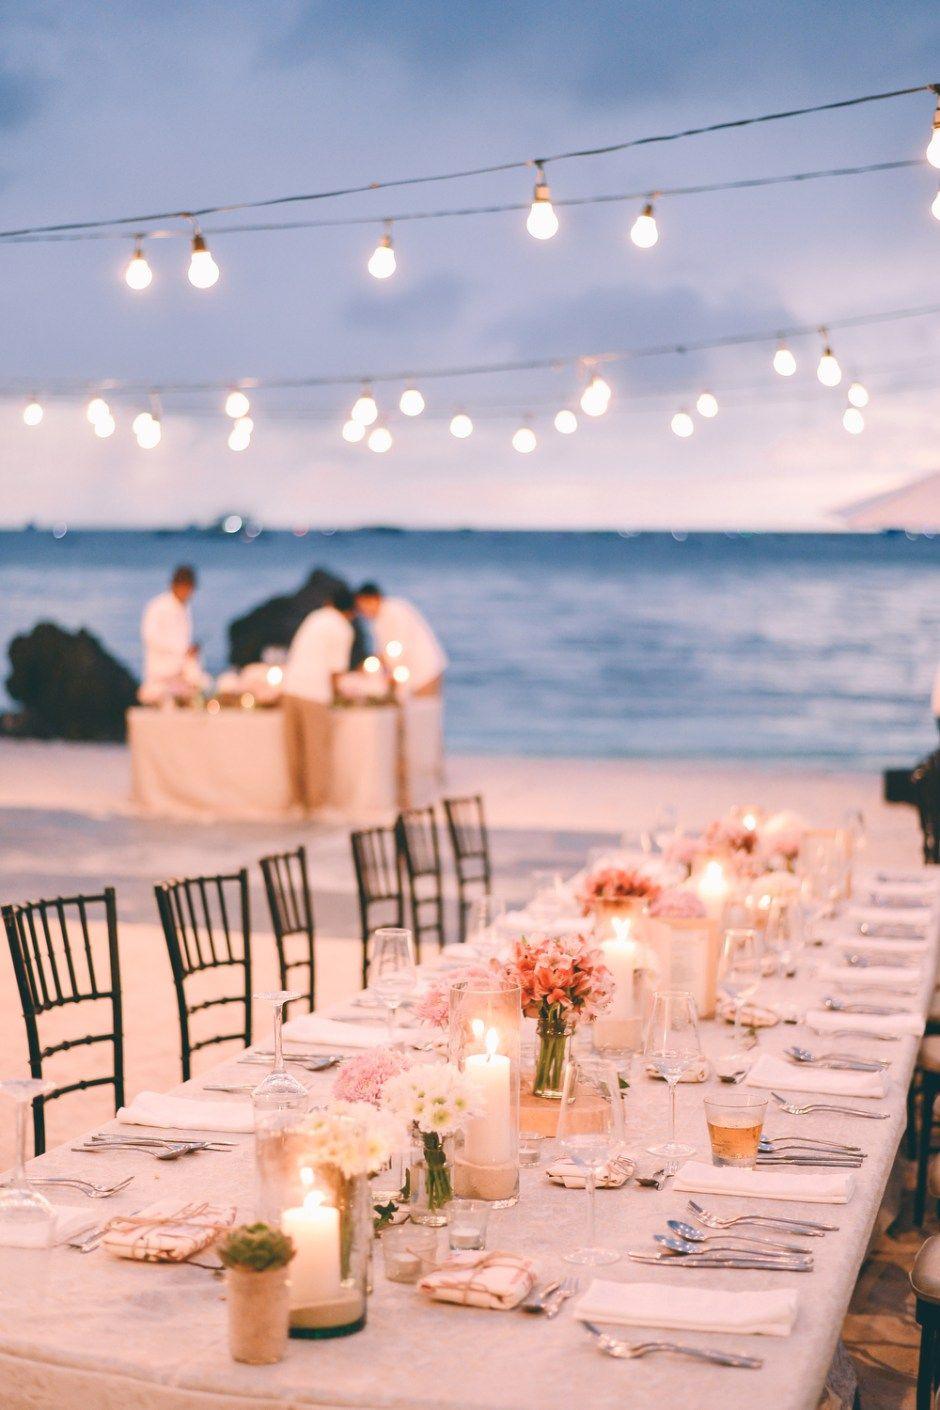 Wedding Reception Places Venues Ceremony Stuff Destination Inspiration